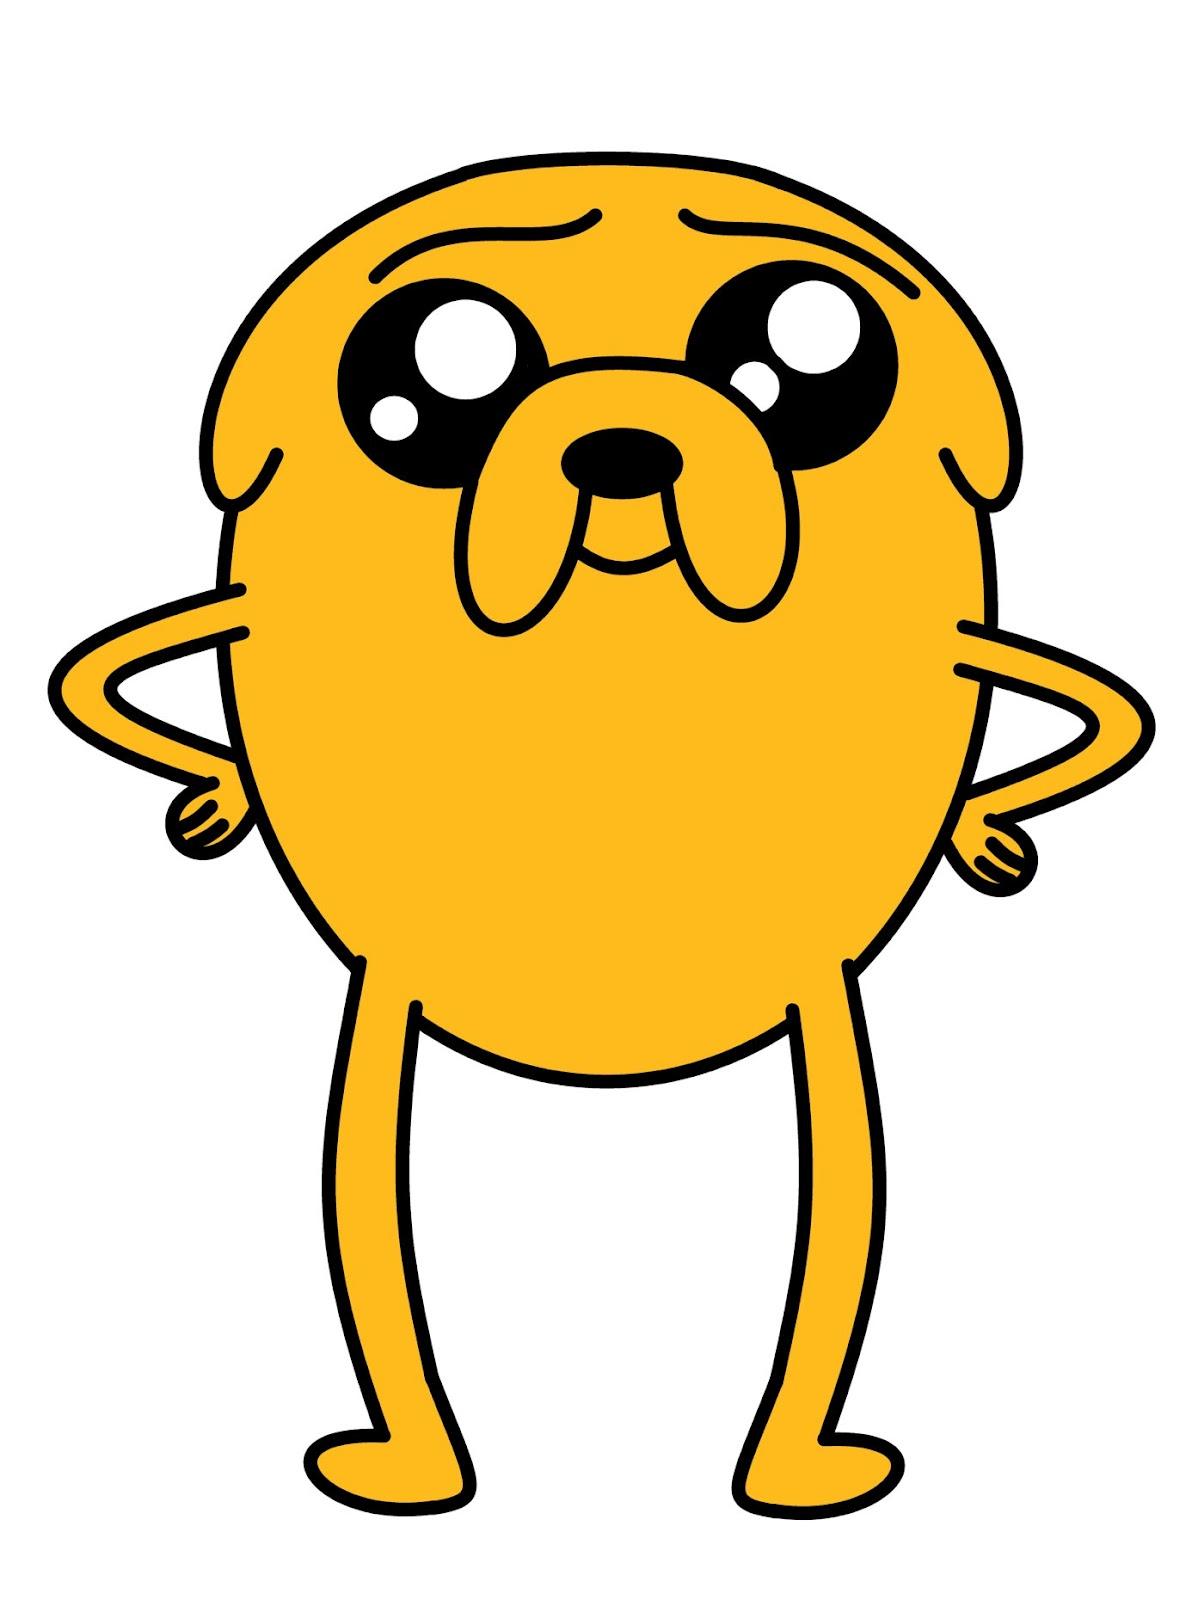 yellow dog clipart - photo #29